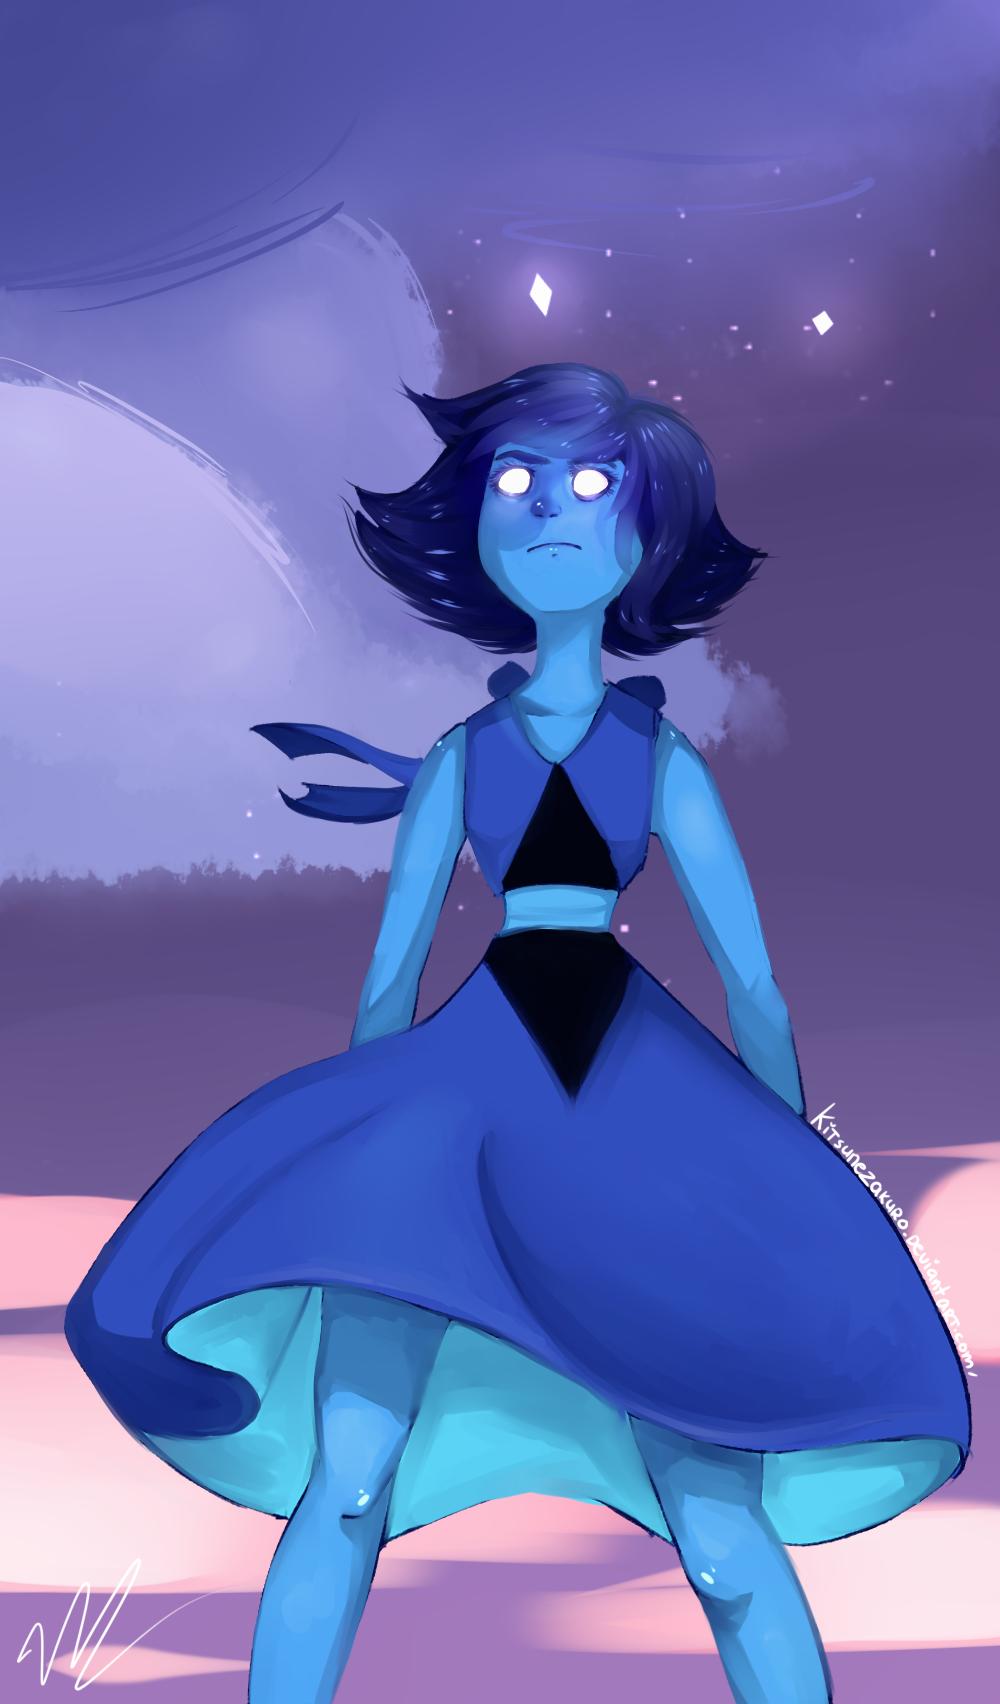 steven universe lapis lazuli by kitsunezakuro on deviantart